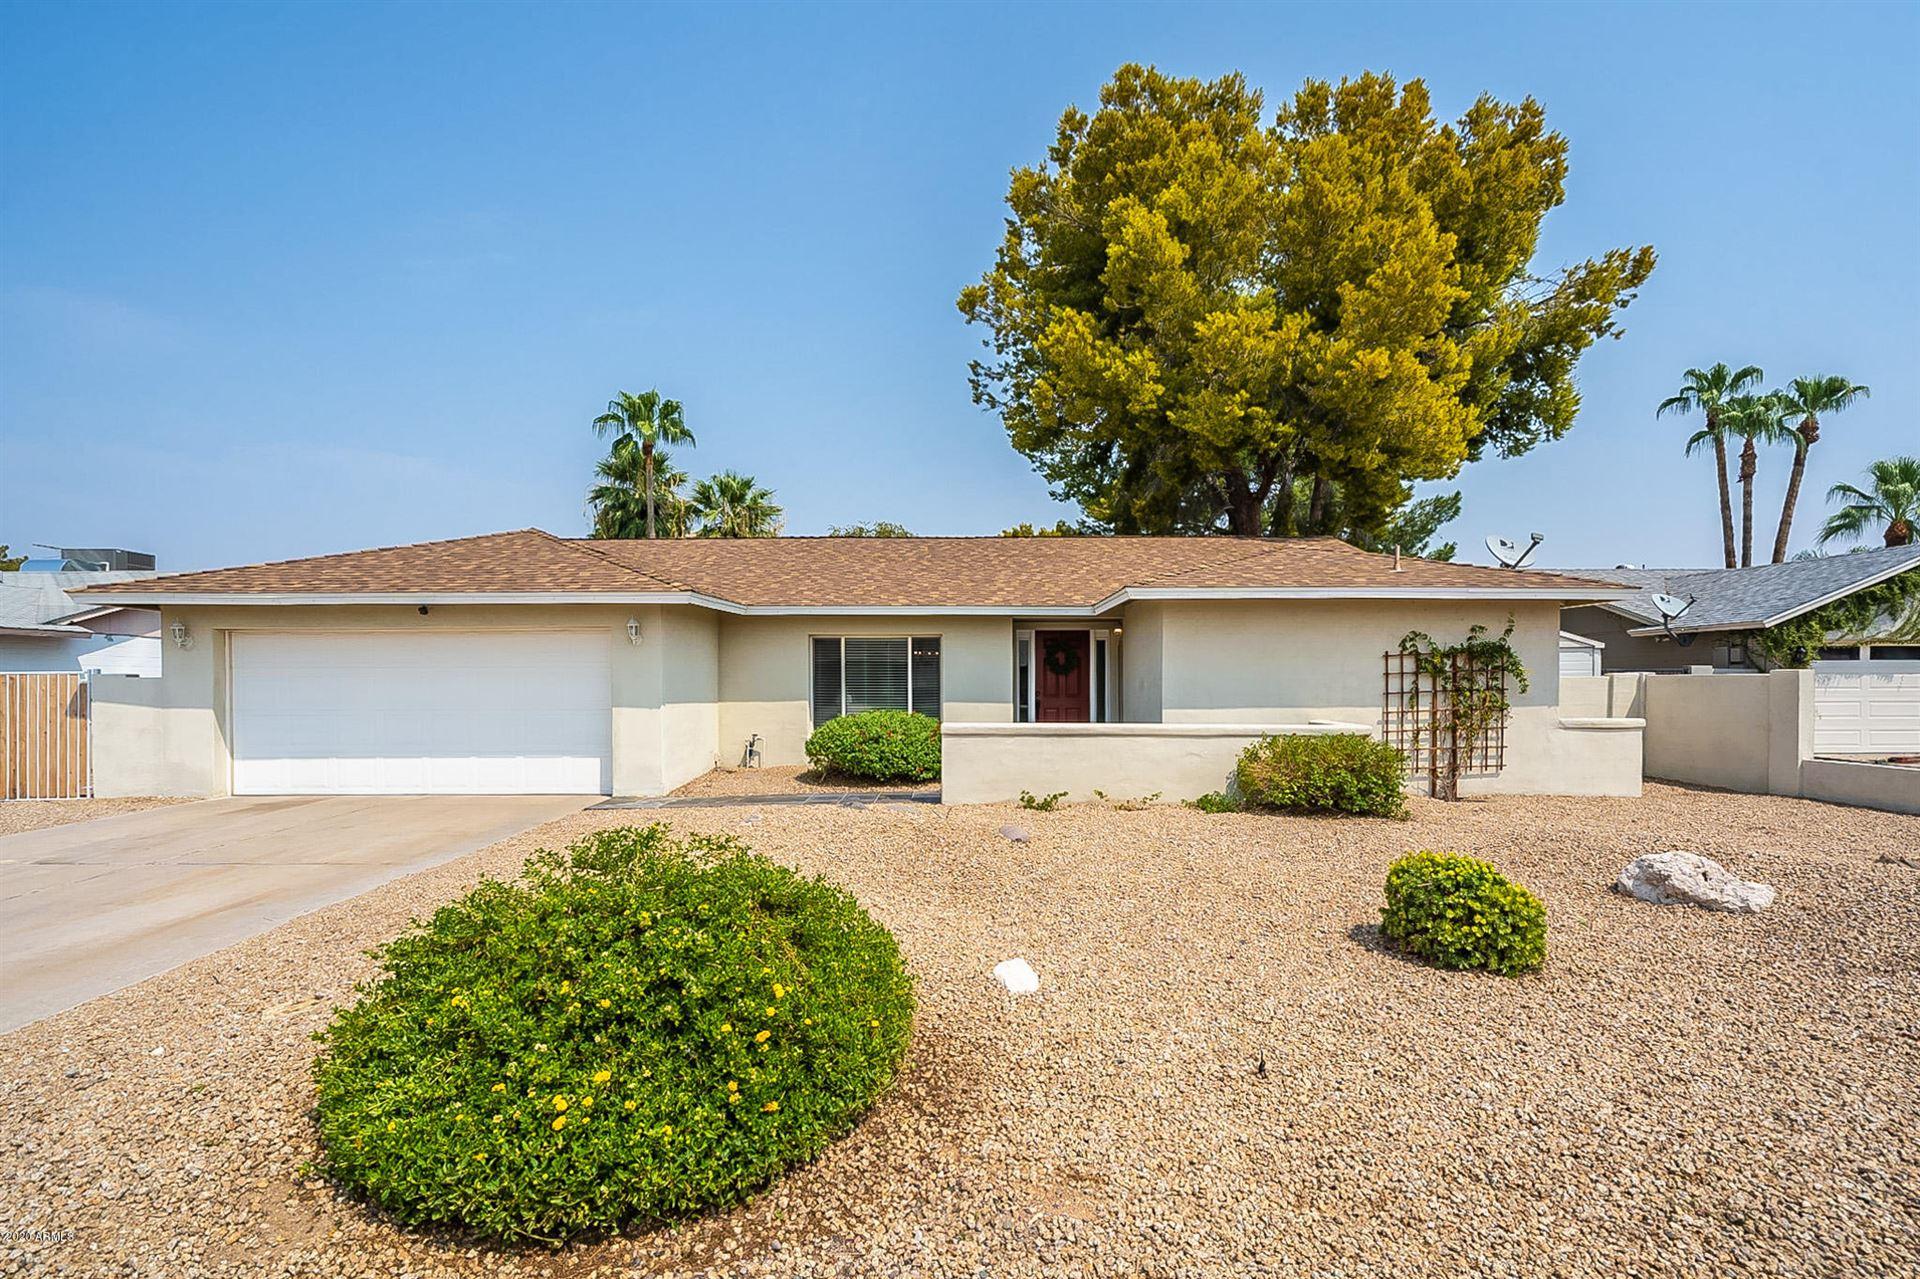 4918 E PRESIDIO Road, Scottsdale, AZ 85254 - MLS#: 6123160